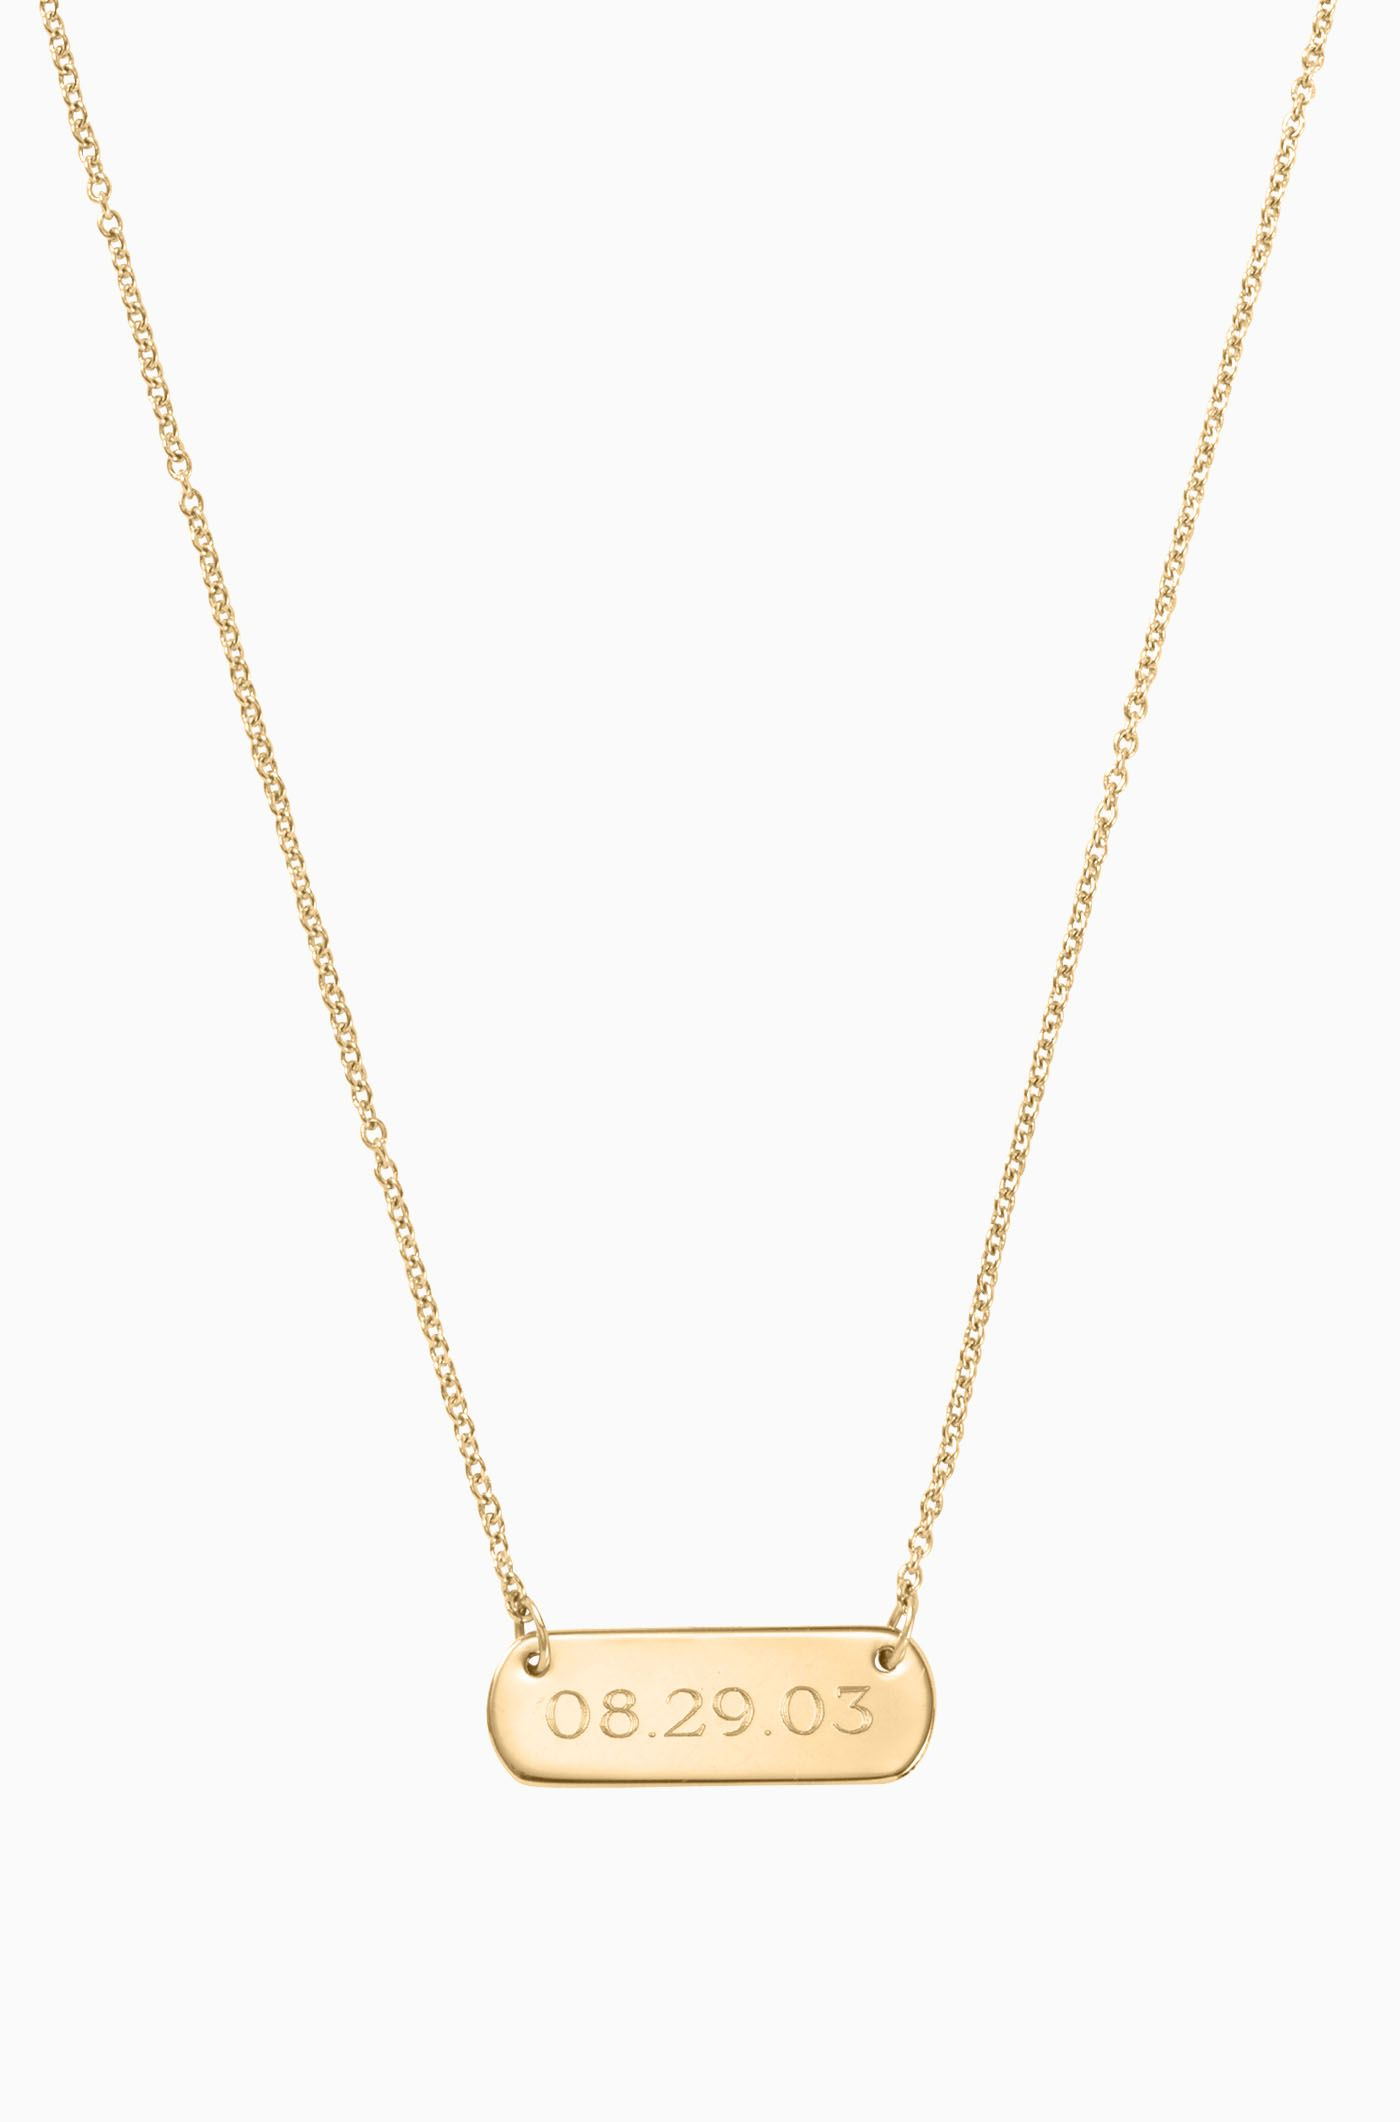 7e14f26211840 Signature Engravable Bar Necklace - Gold | Wish List | Gold bar ...